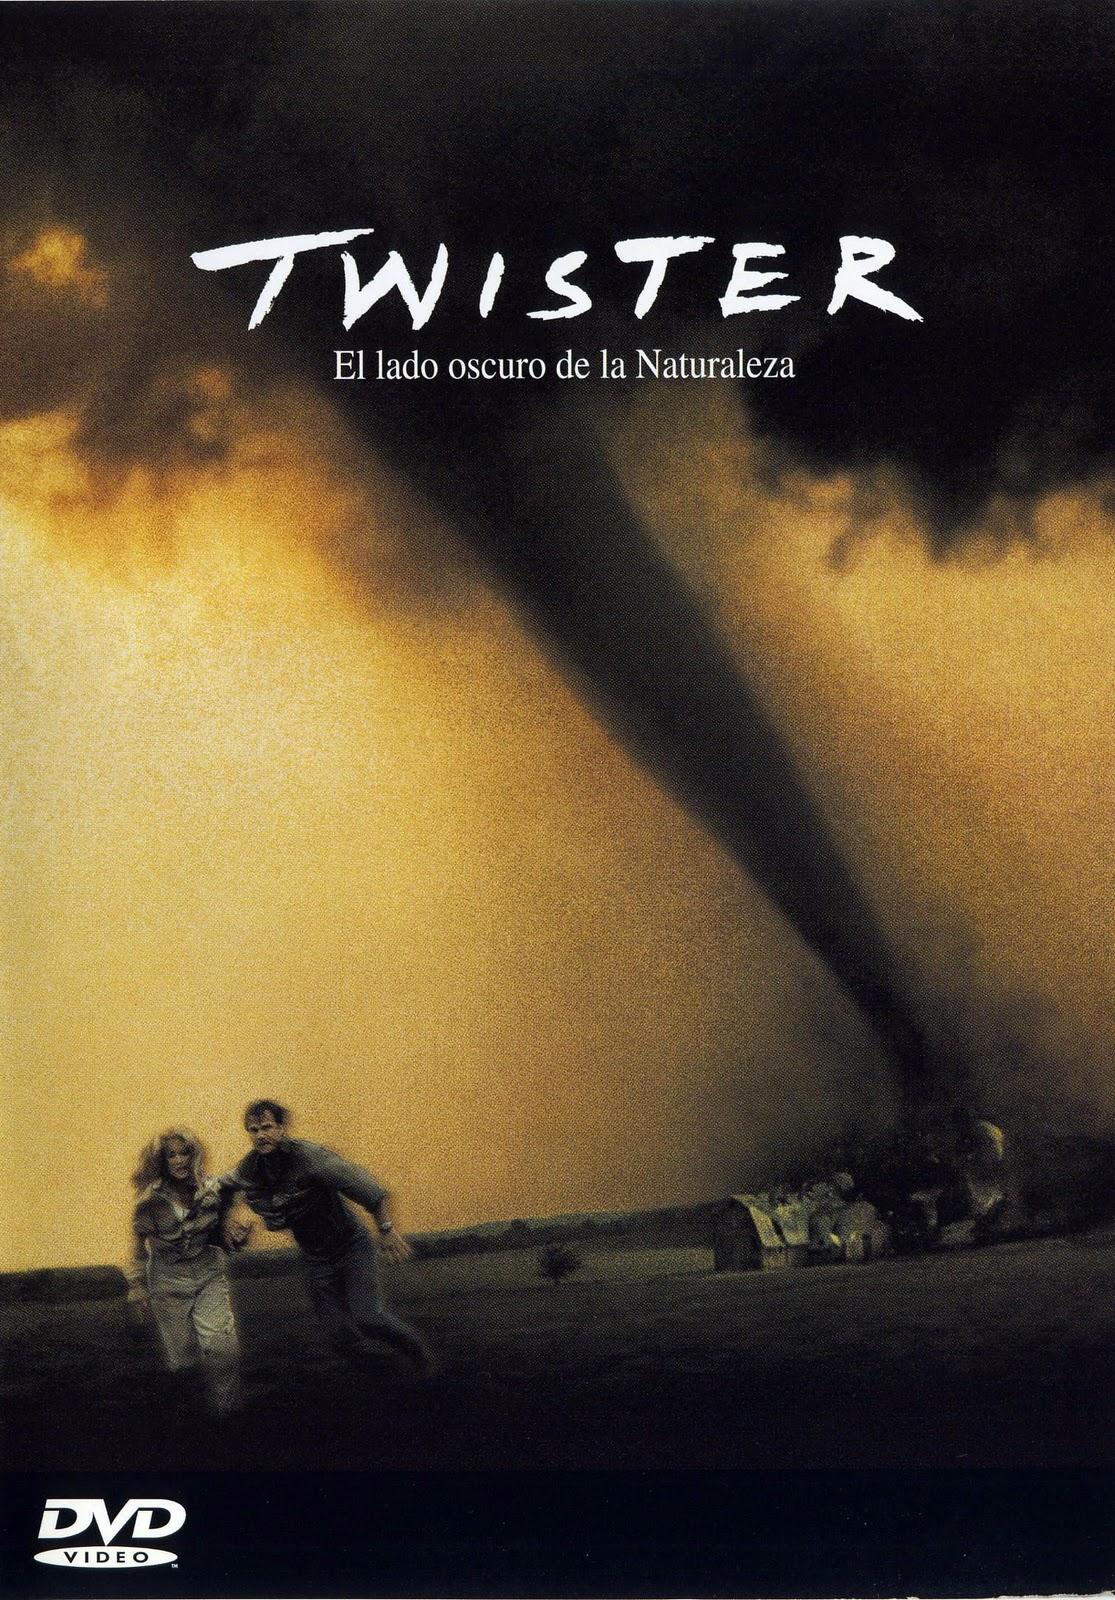 http://2.bp.blogspot.com/_opNgGsn1YIY/TPLcuy6JO7I/AAAAAAAAWSY/9bjNxpdCP1I/s1600/Twister.jpg